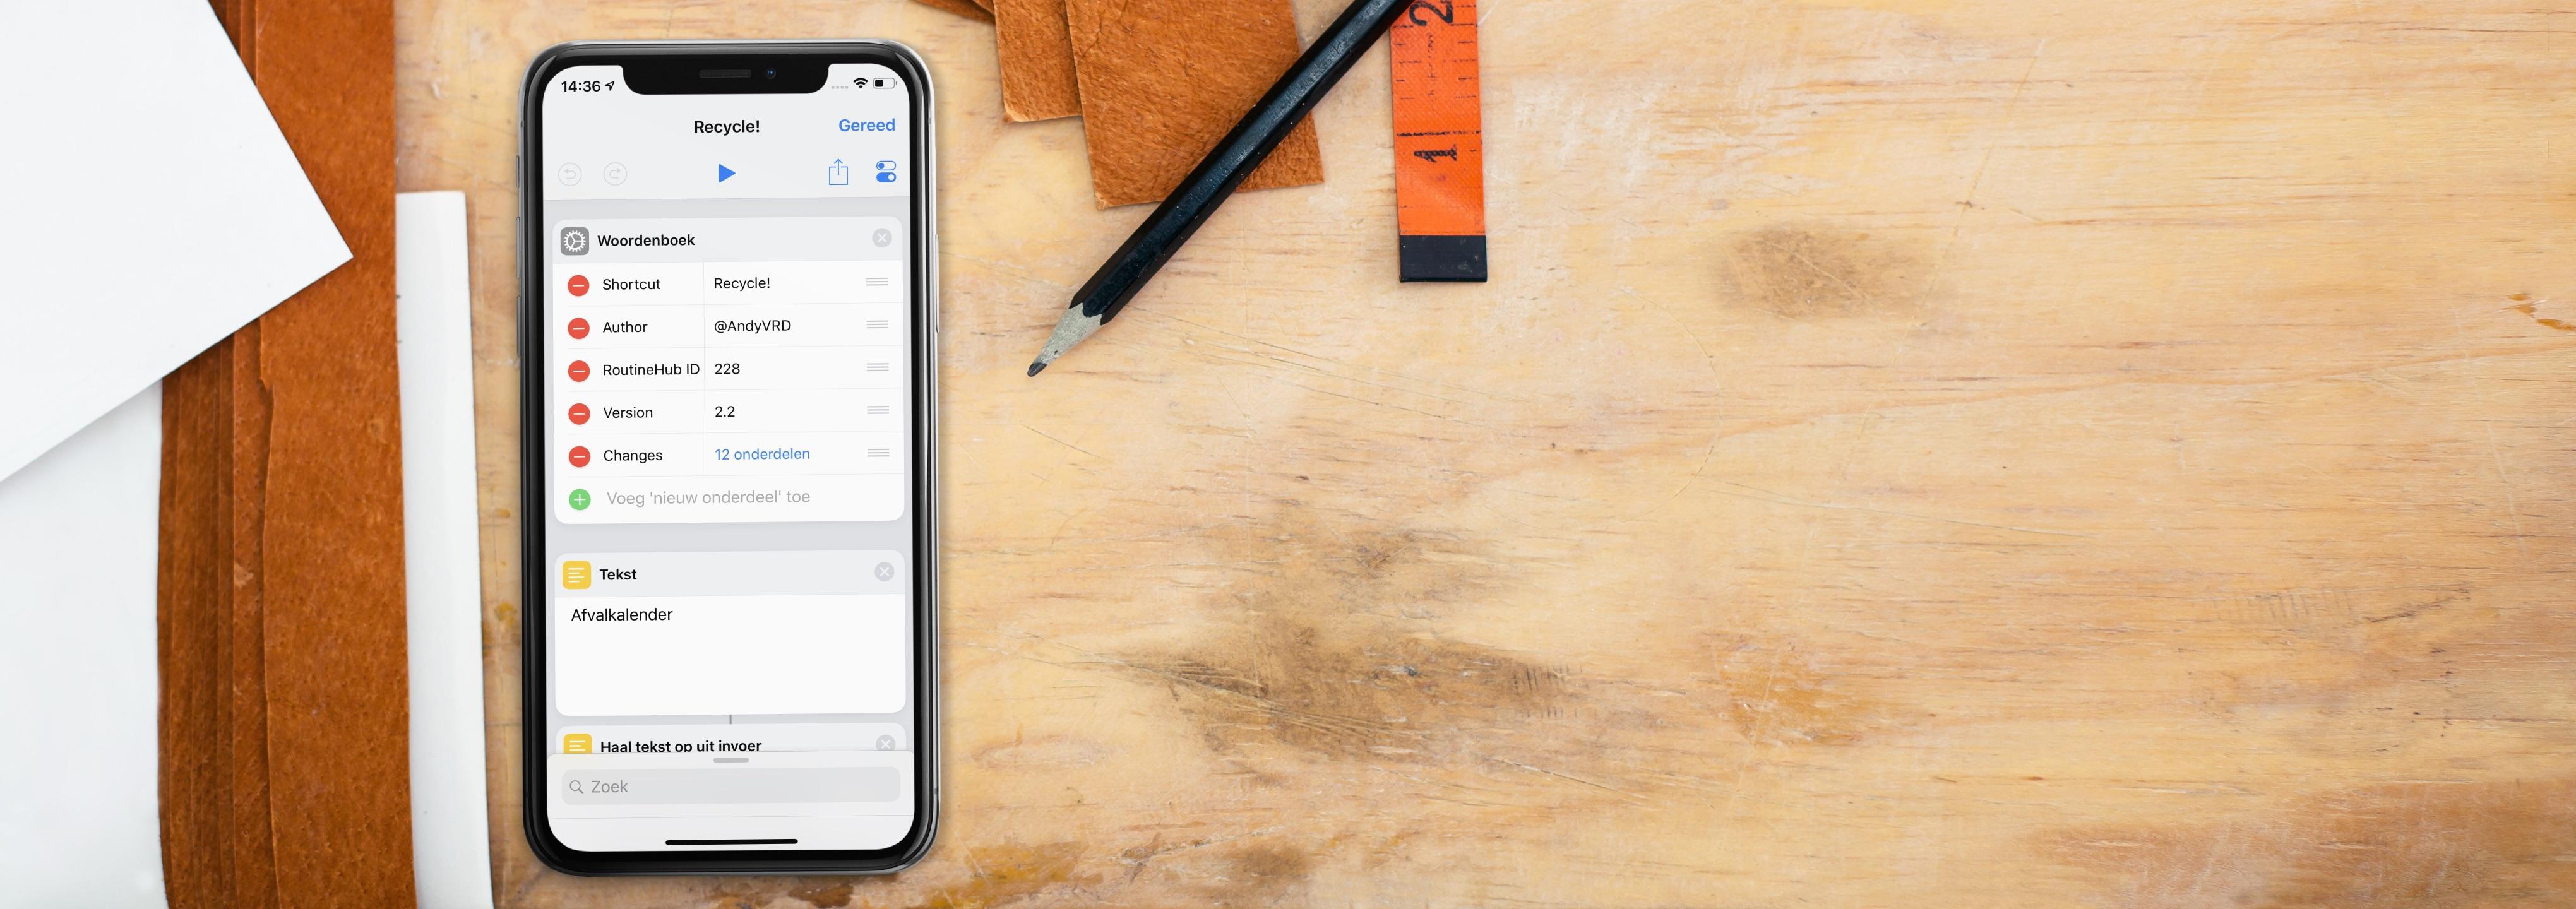 iPhone op bureau met Recycle Siri Shortcut als screenshot.